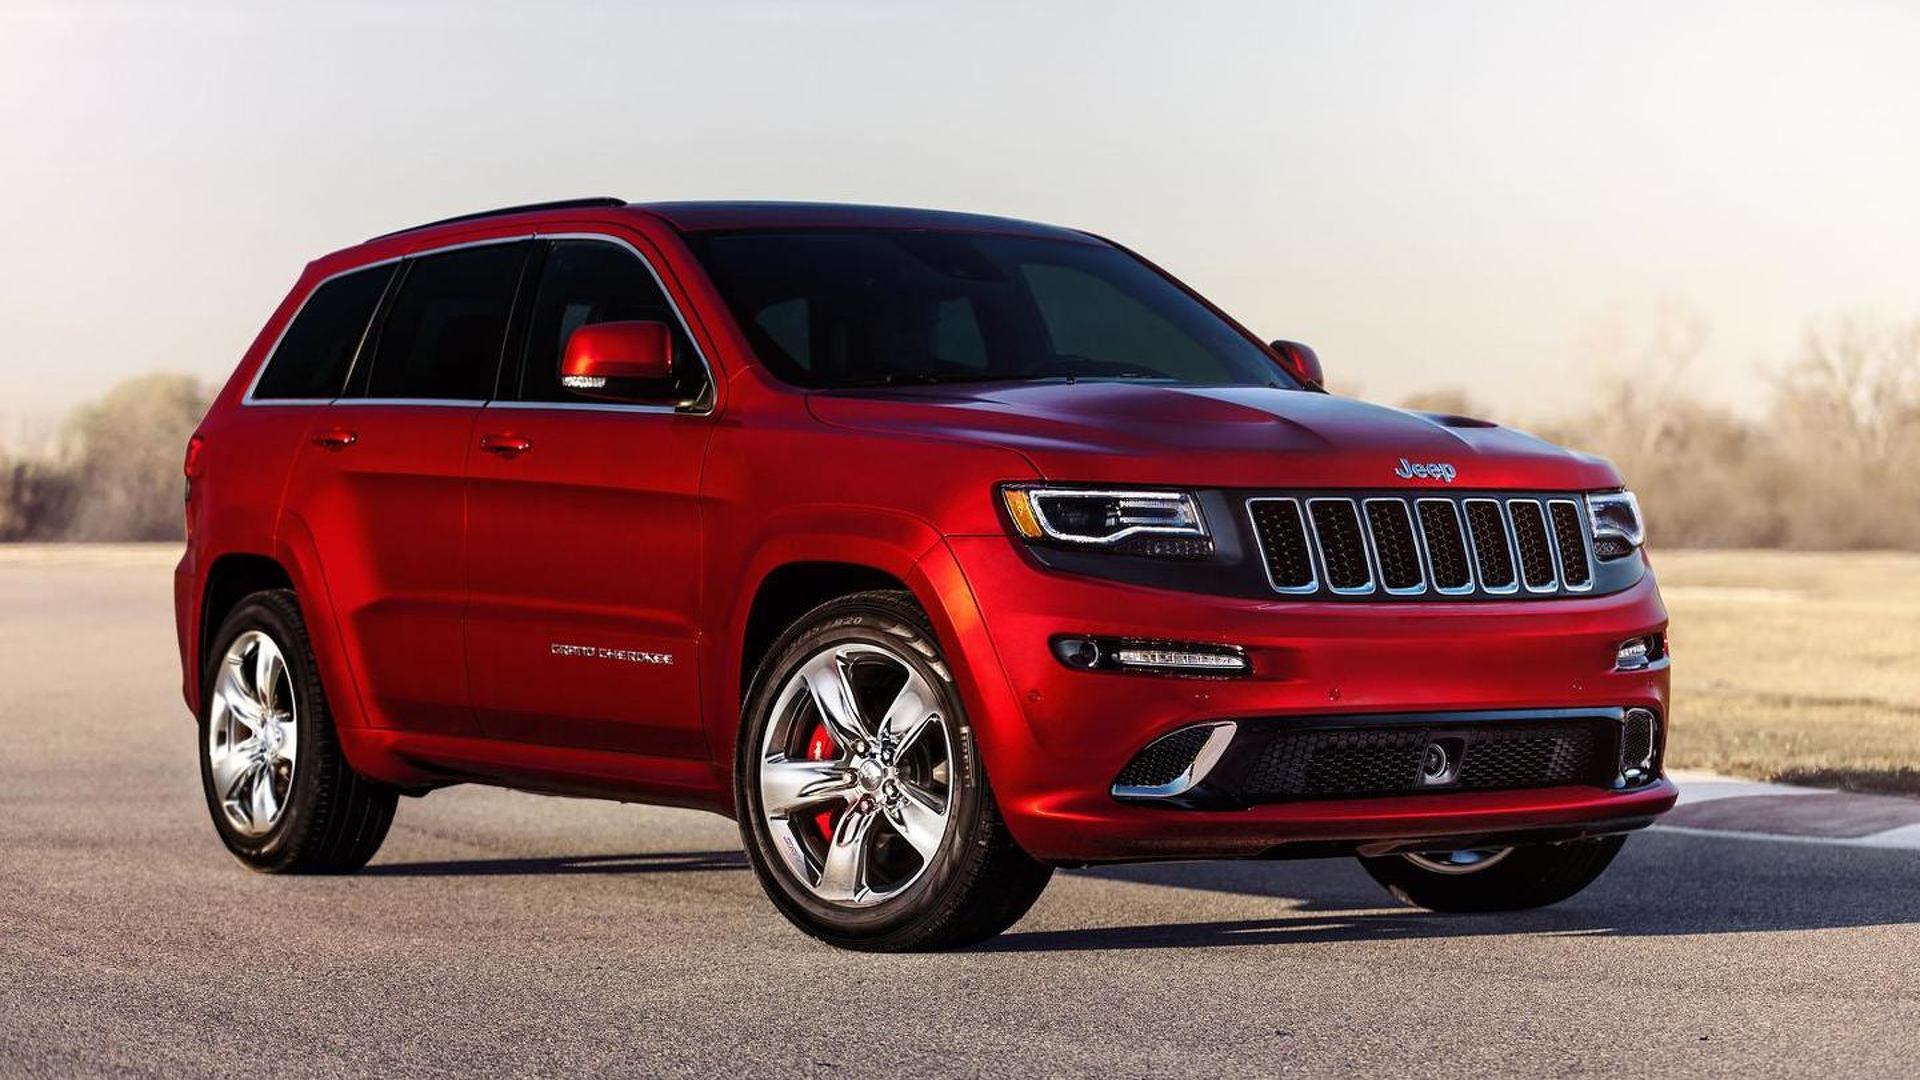 http://icdn-1.motor1.com/images/mgl/WoE21/s1/2014-499402-2015-jeep-grand-cherokee-srt1.jpg